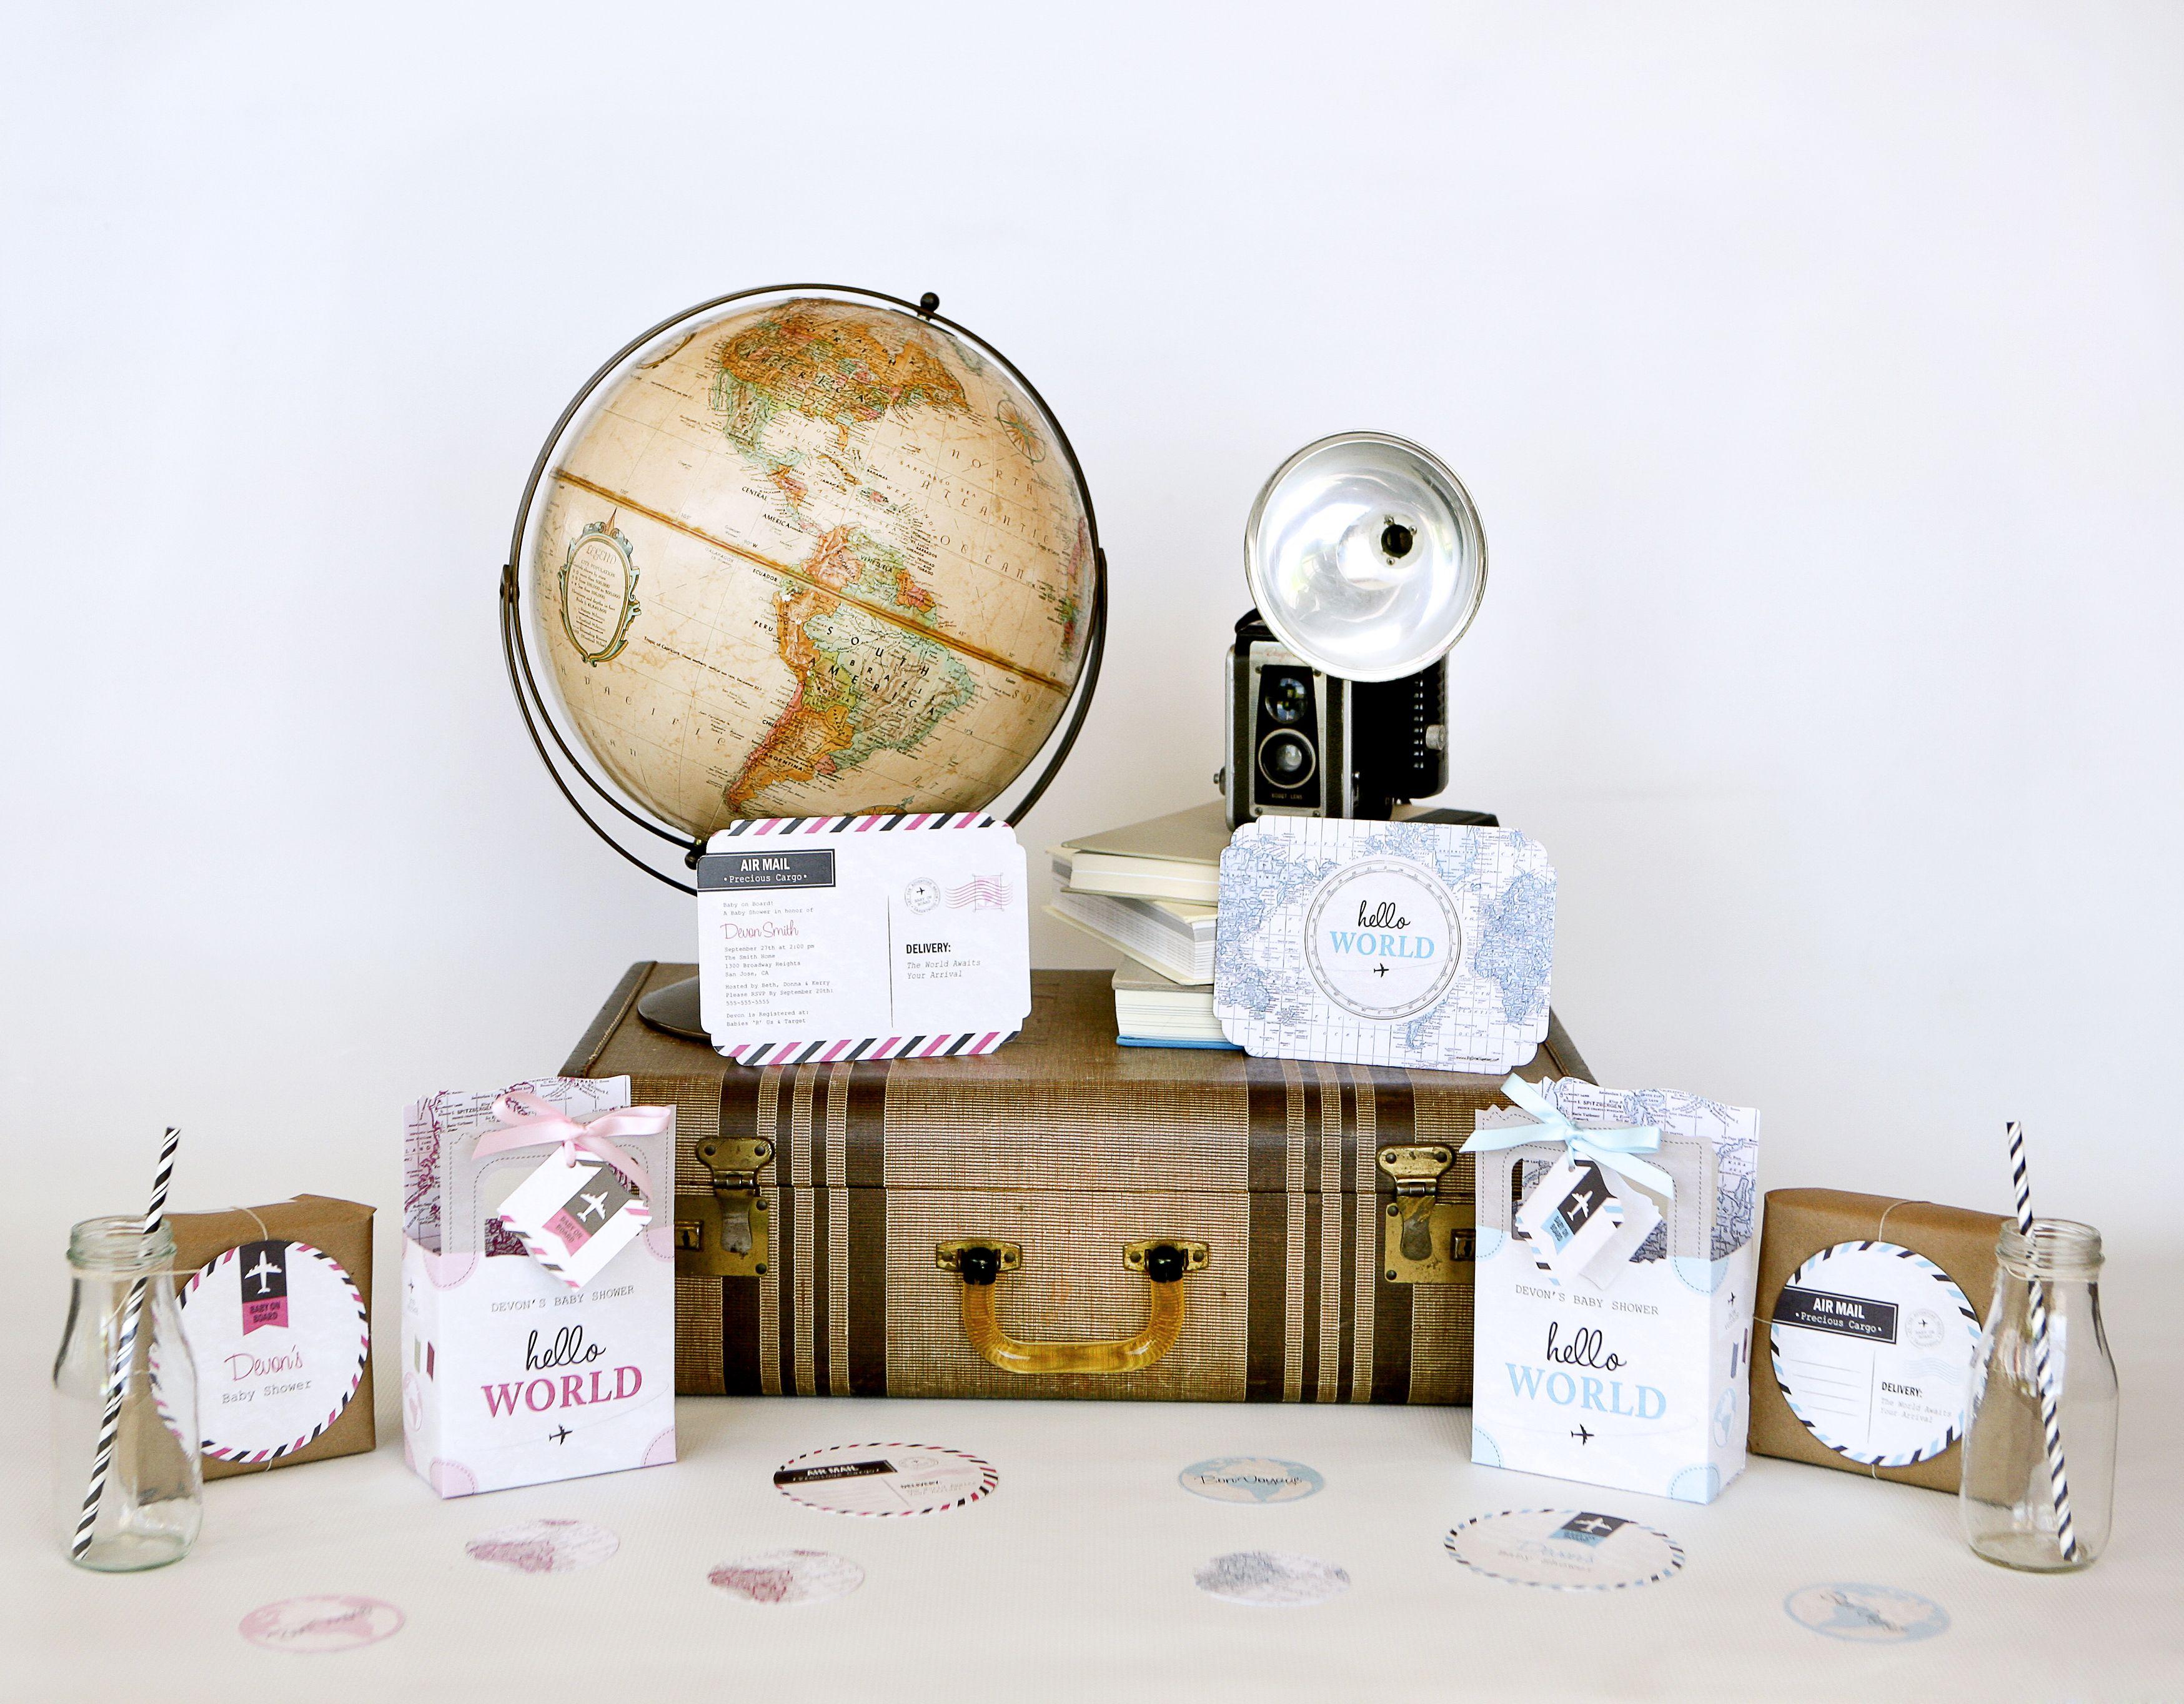 Hello World Precious Cargo Baby Shower Themes Wel e to the